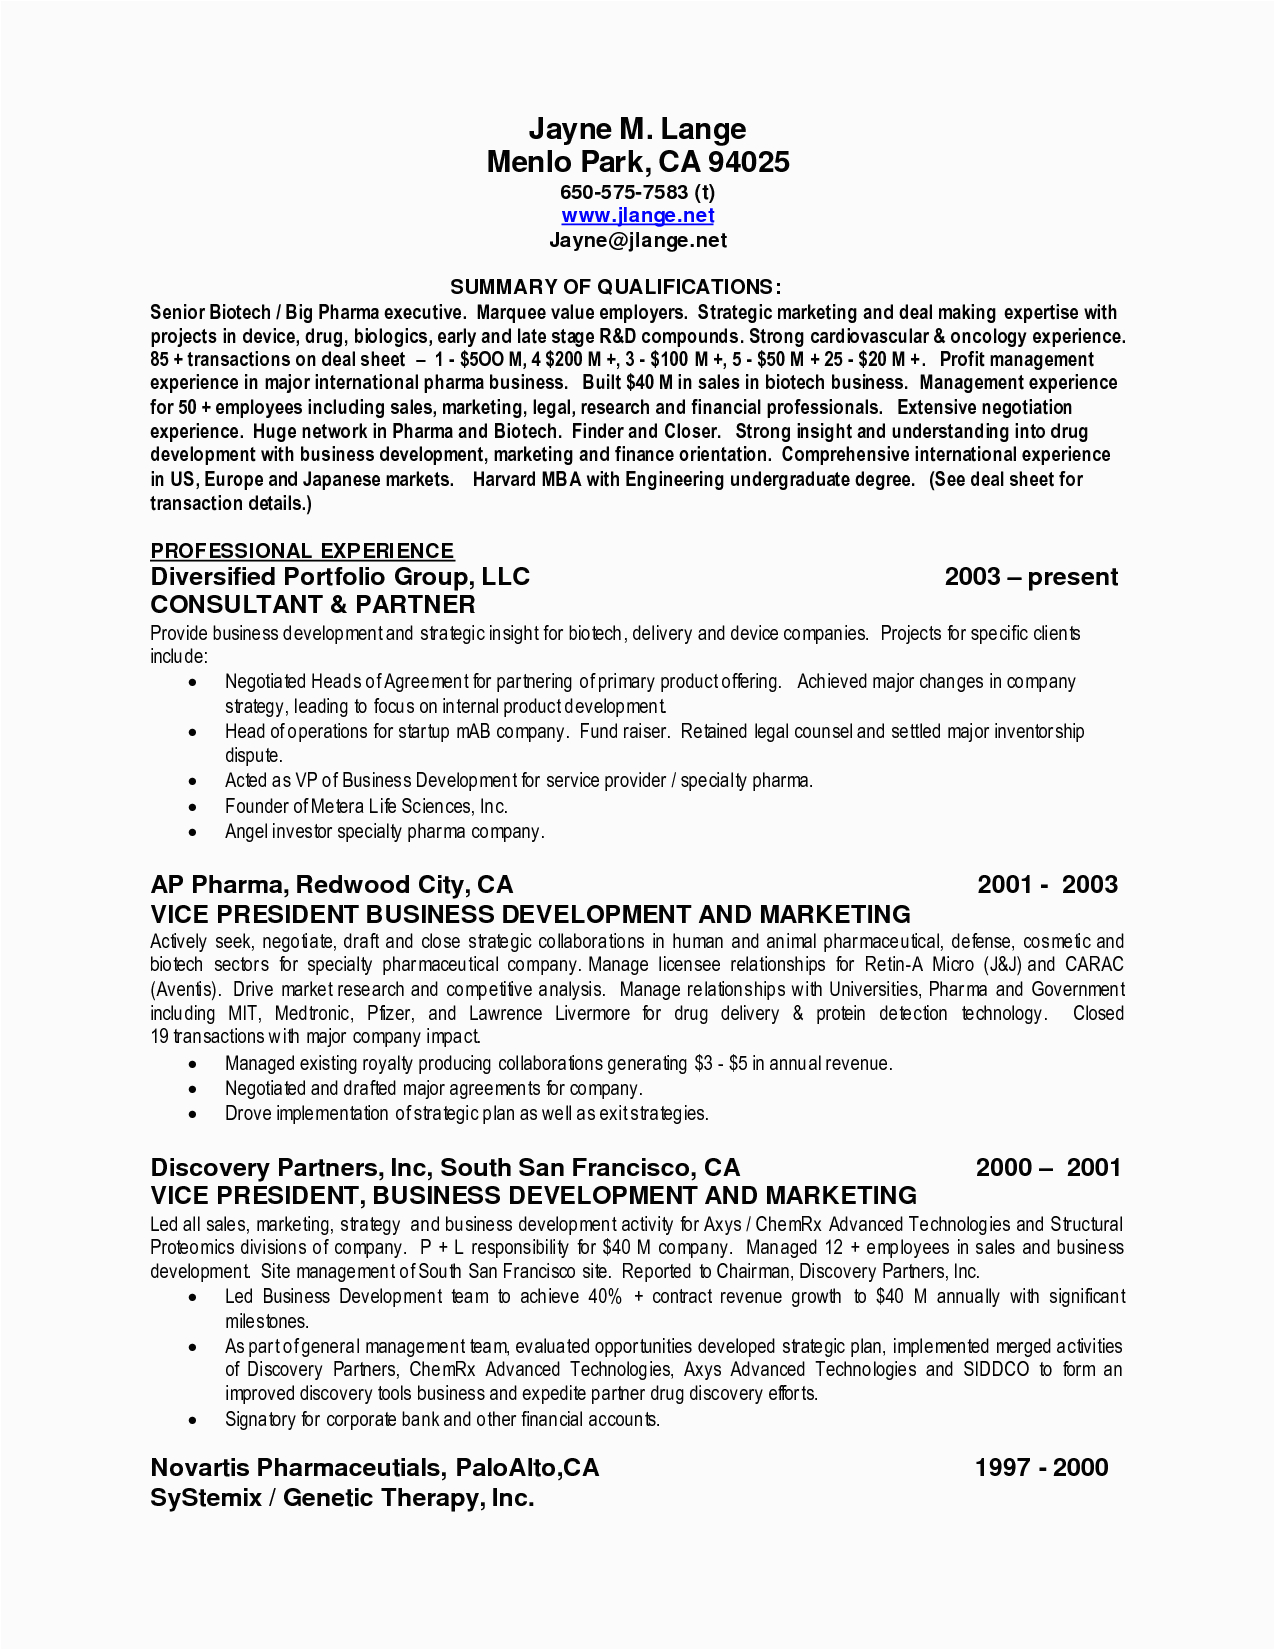 Sample Resume Summary Of Qualifications Examples Best Summary Of Qualifications Resume for 2016